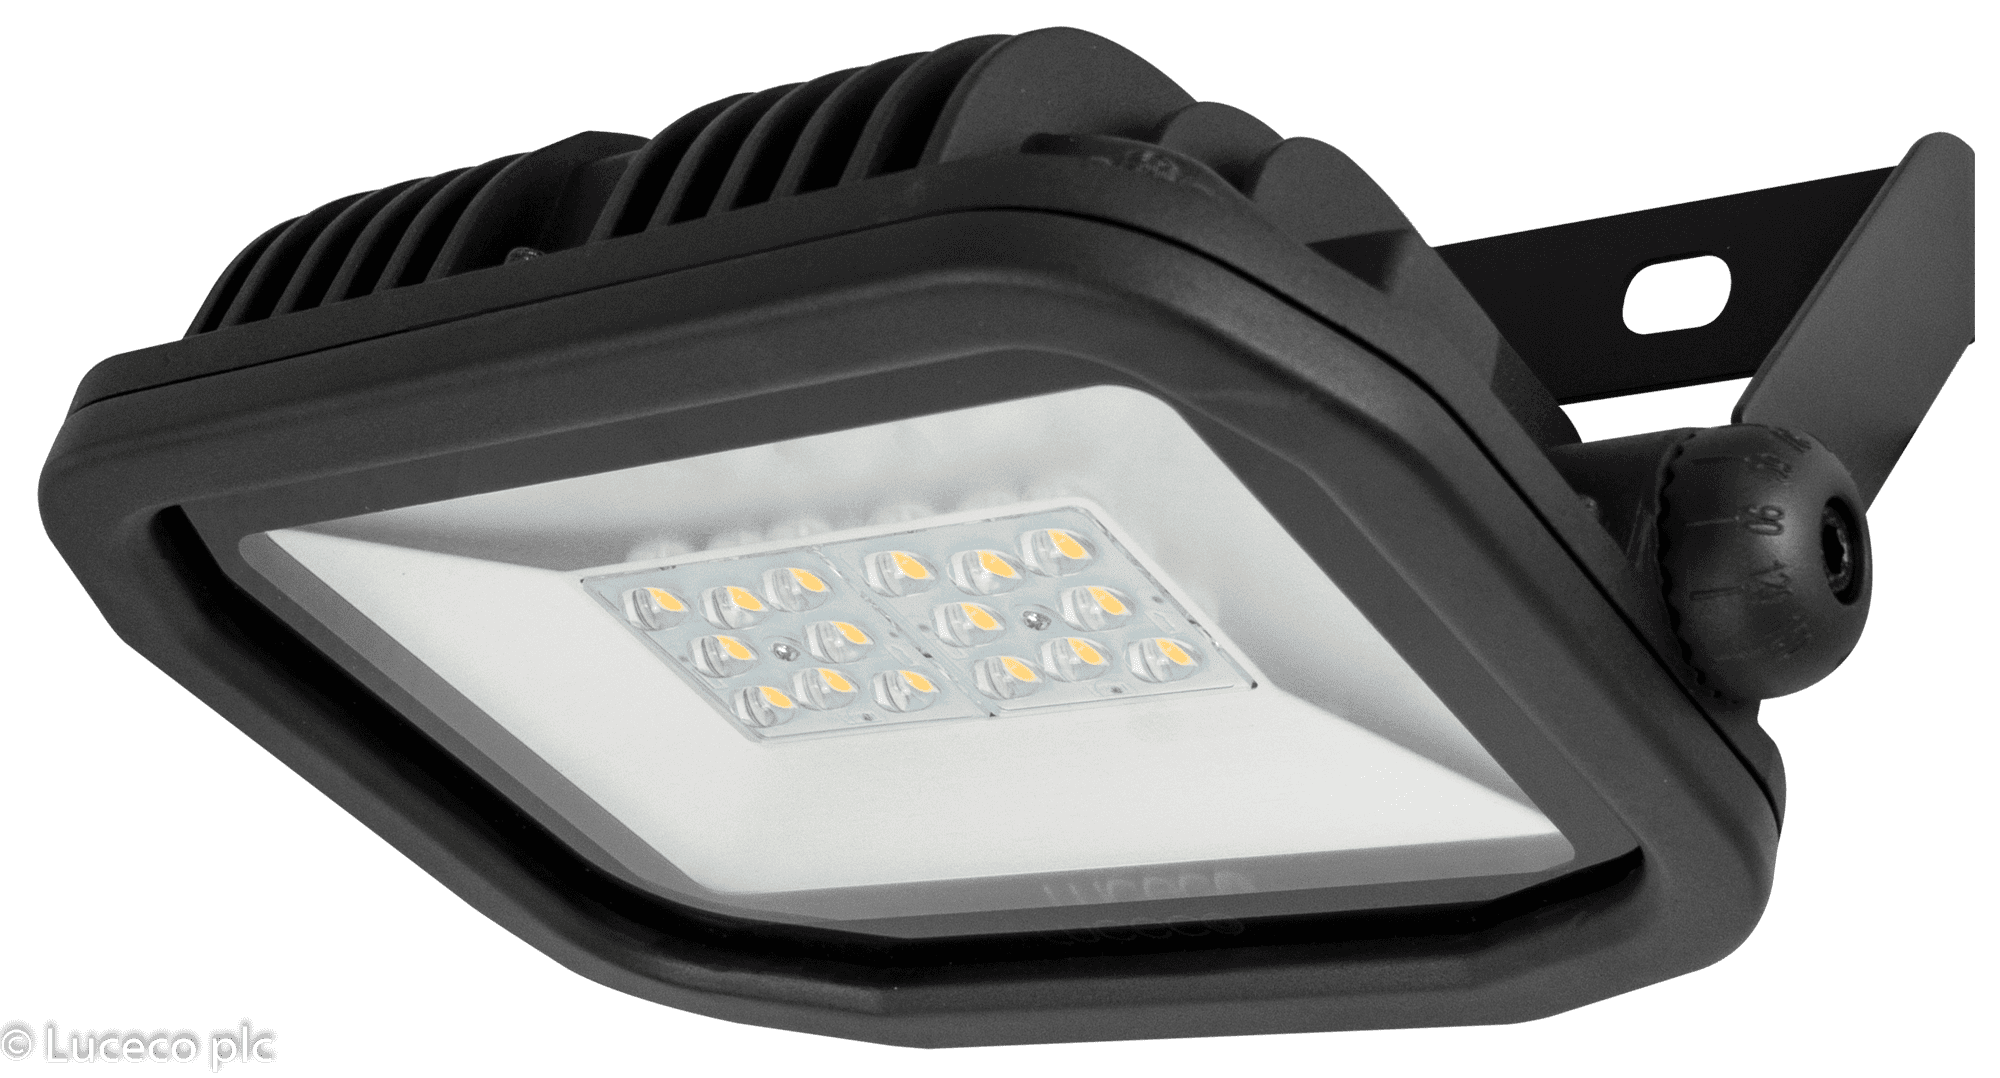 Luceco Profi LED-Fluter 50W 4000K 6800lm 120° IP65 #LFP50B140F